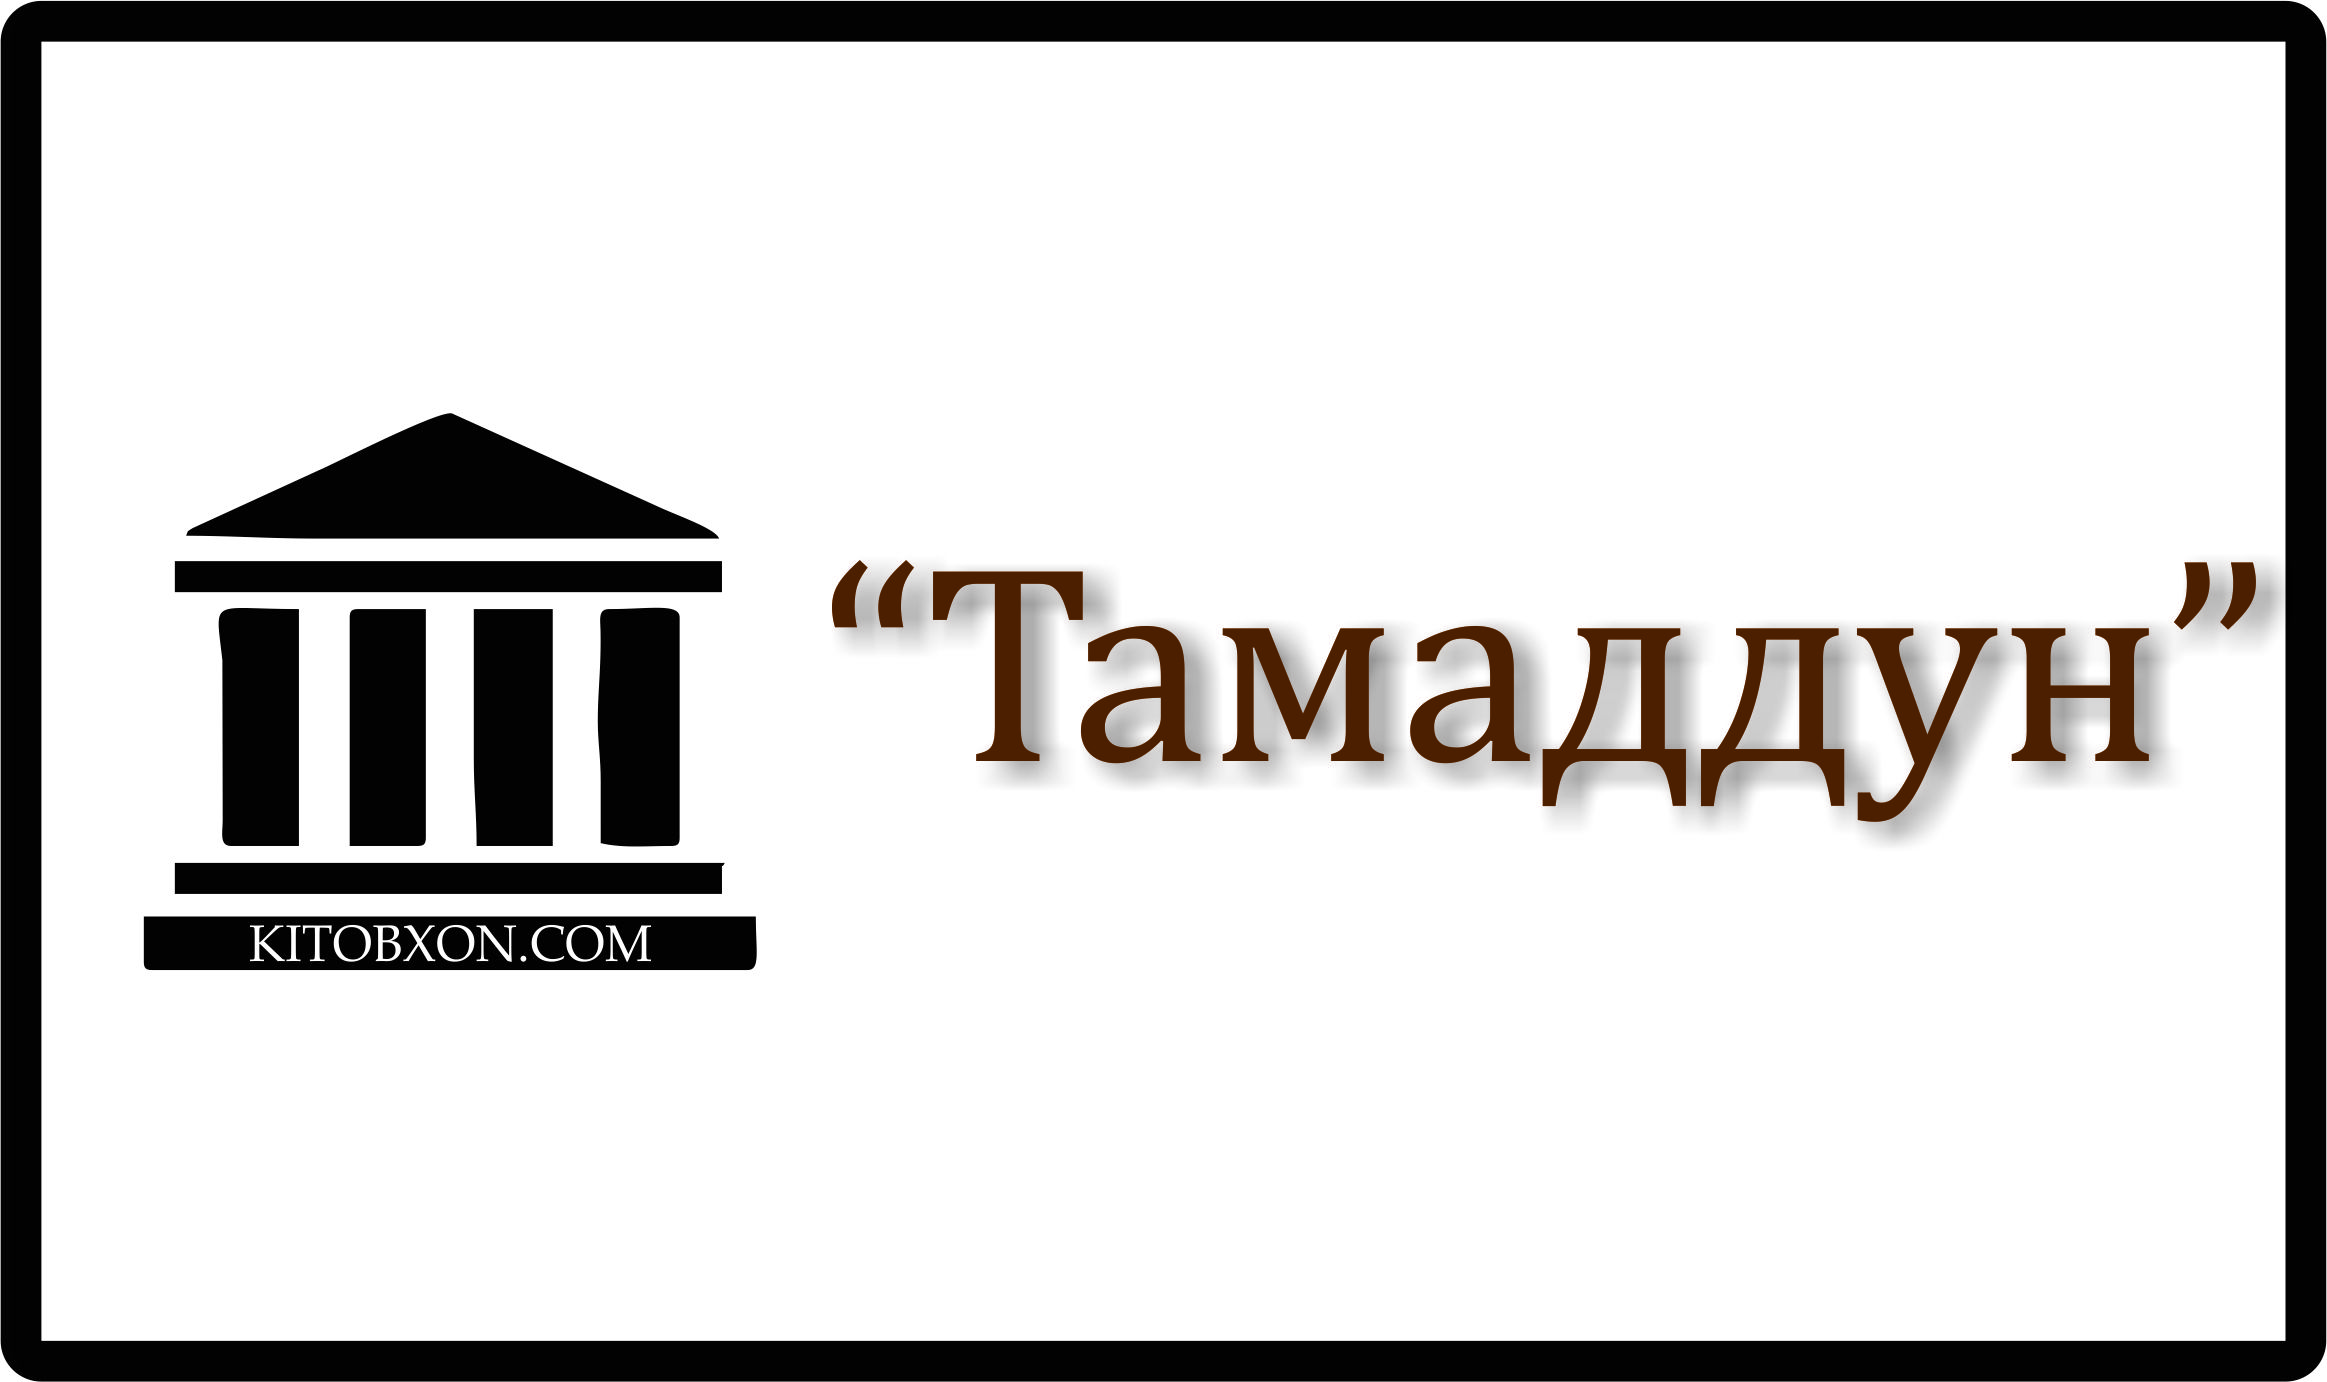 Tamaddun